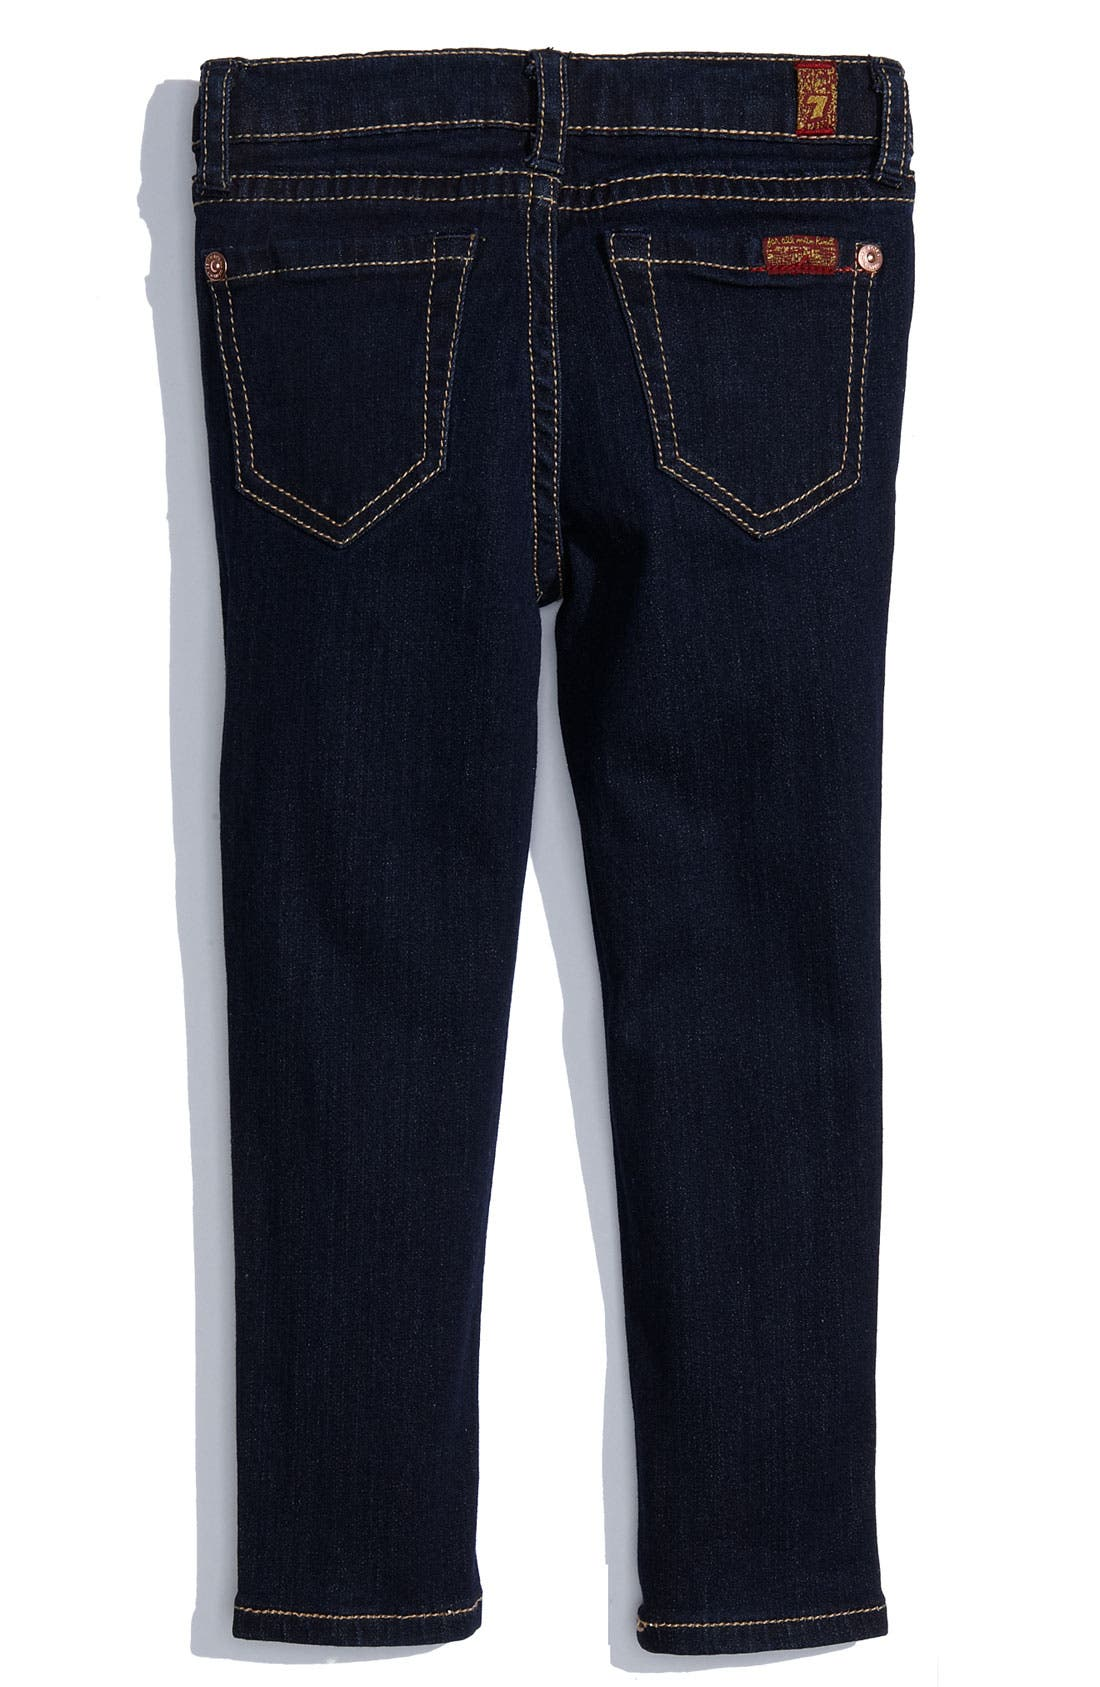 Main Image - 7 For All Mankind® Skinny Denim Jeans (Toddler)